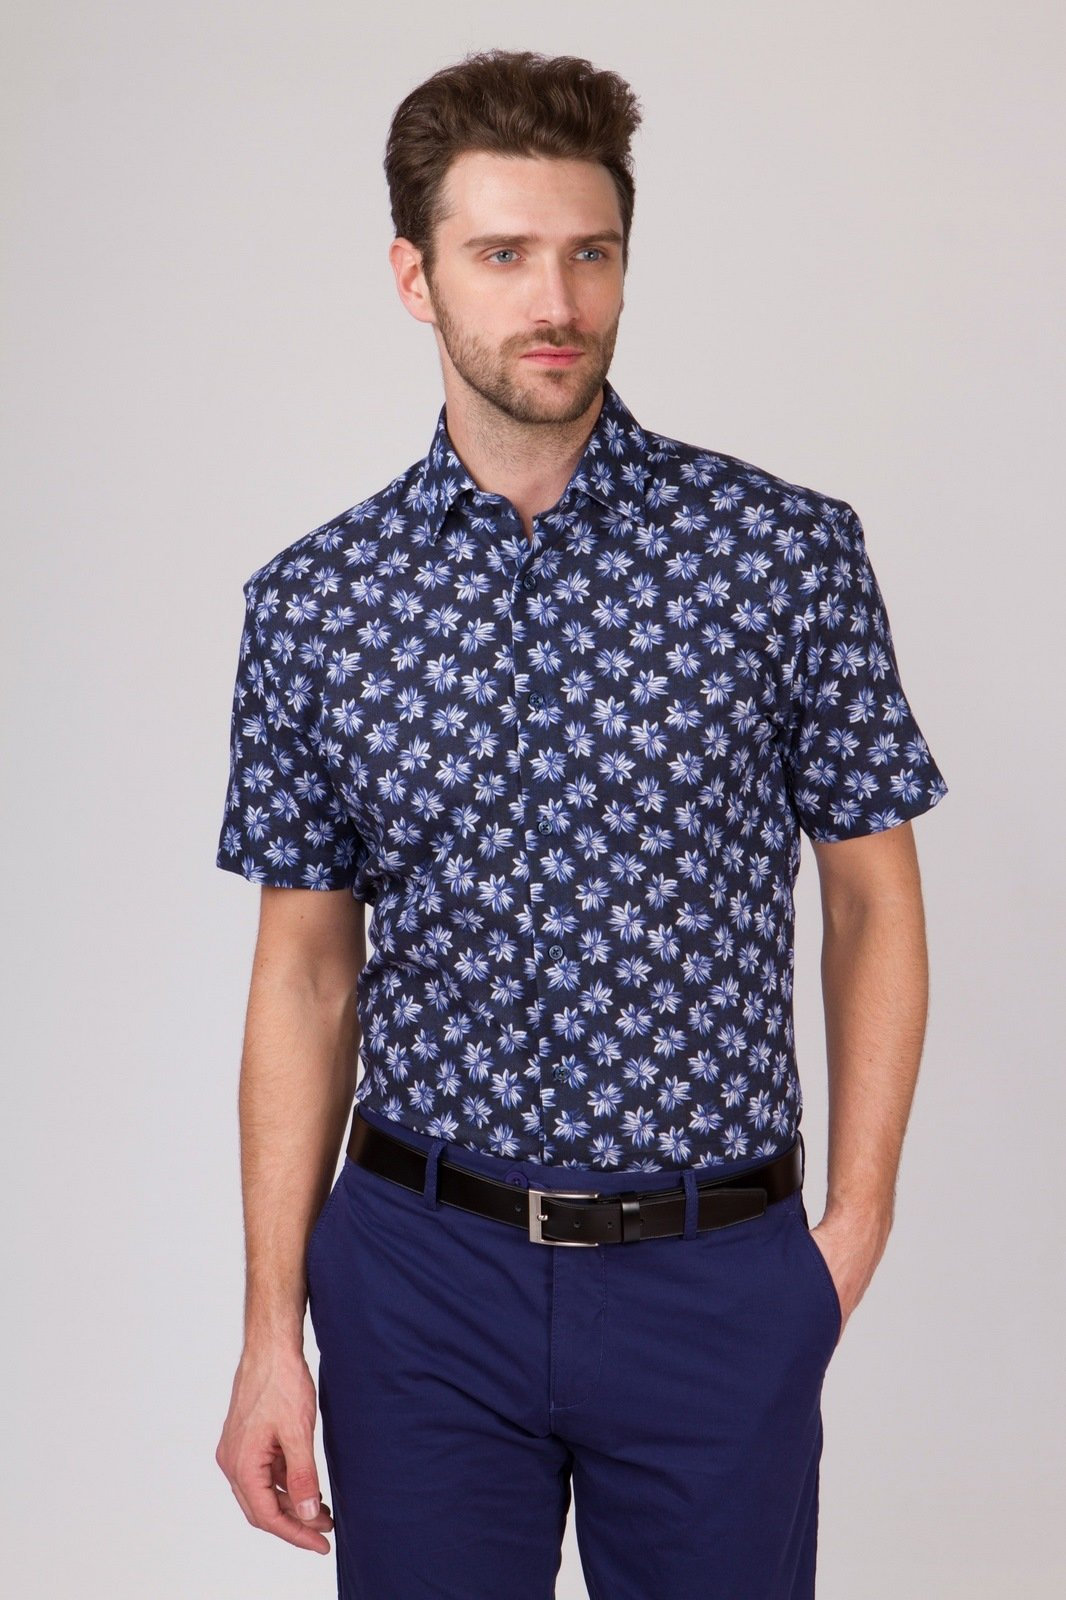 Kanzler Прямая рубашка из хлопка и льна KANZLER